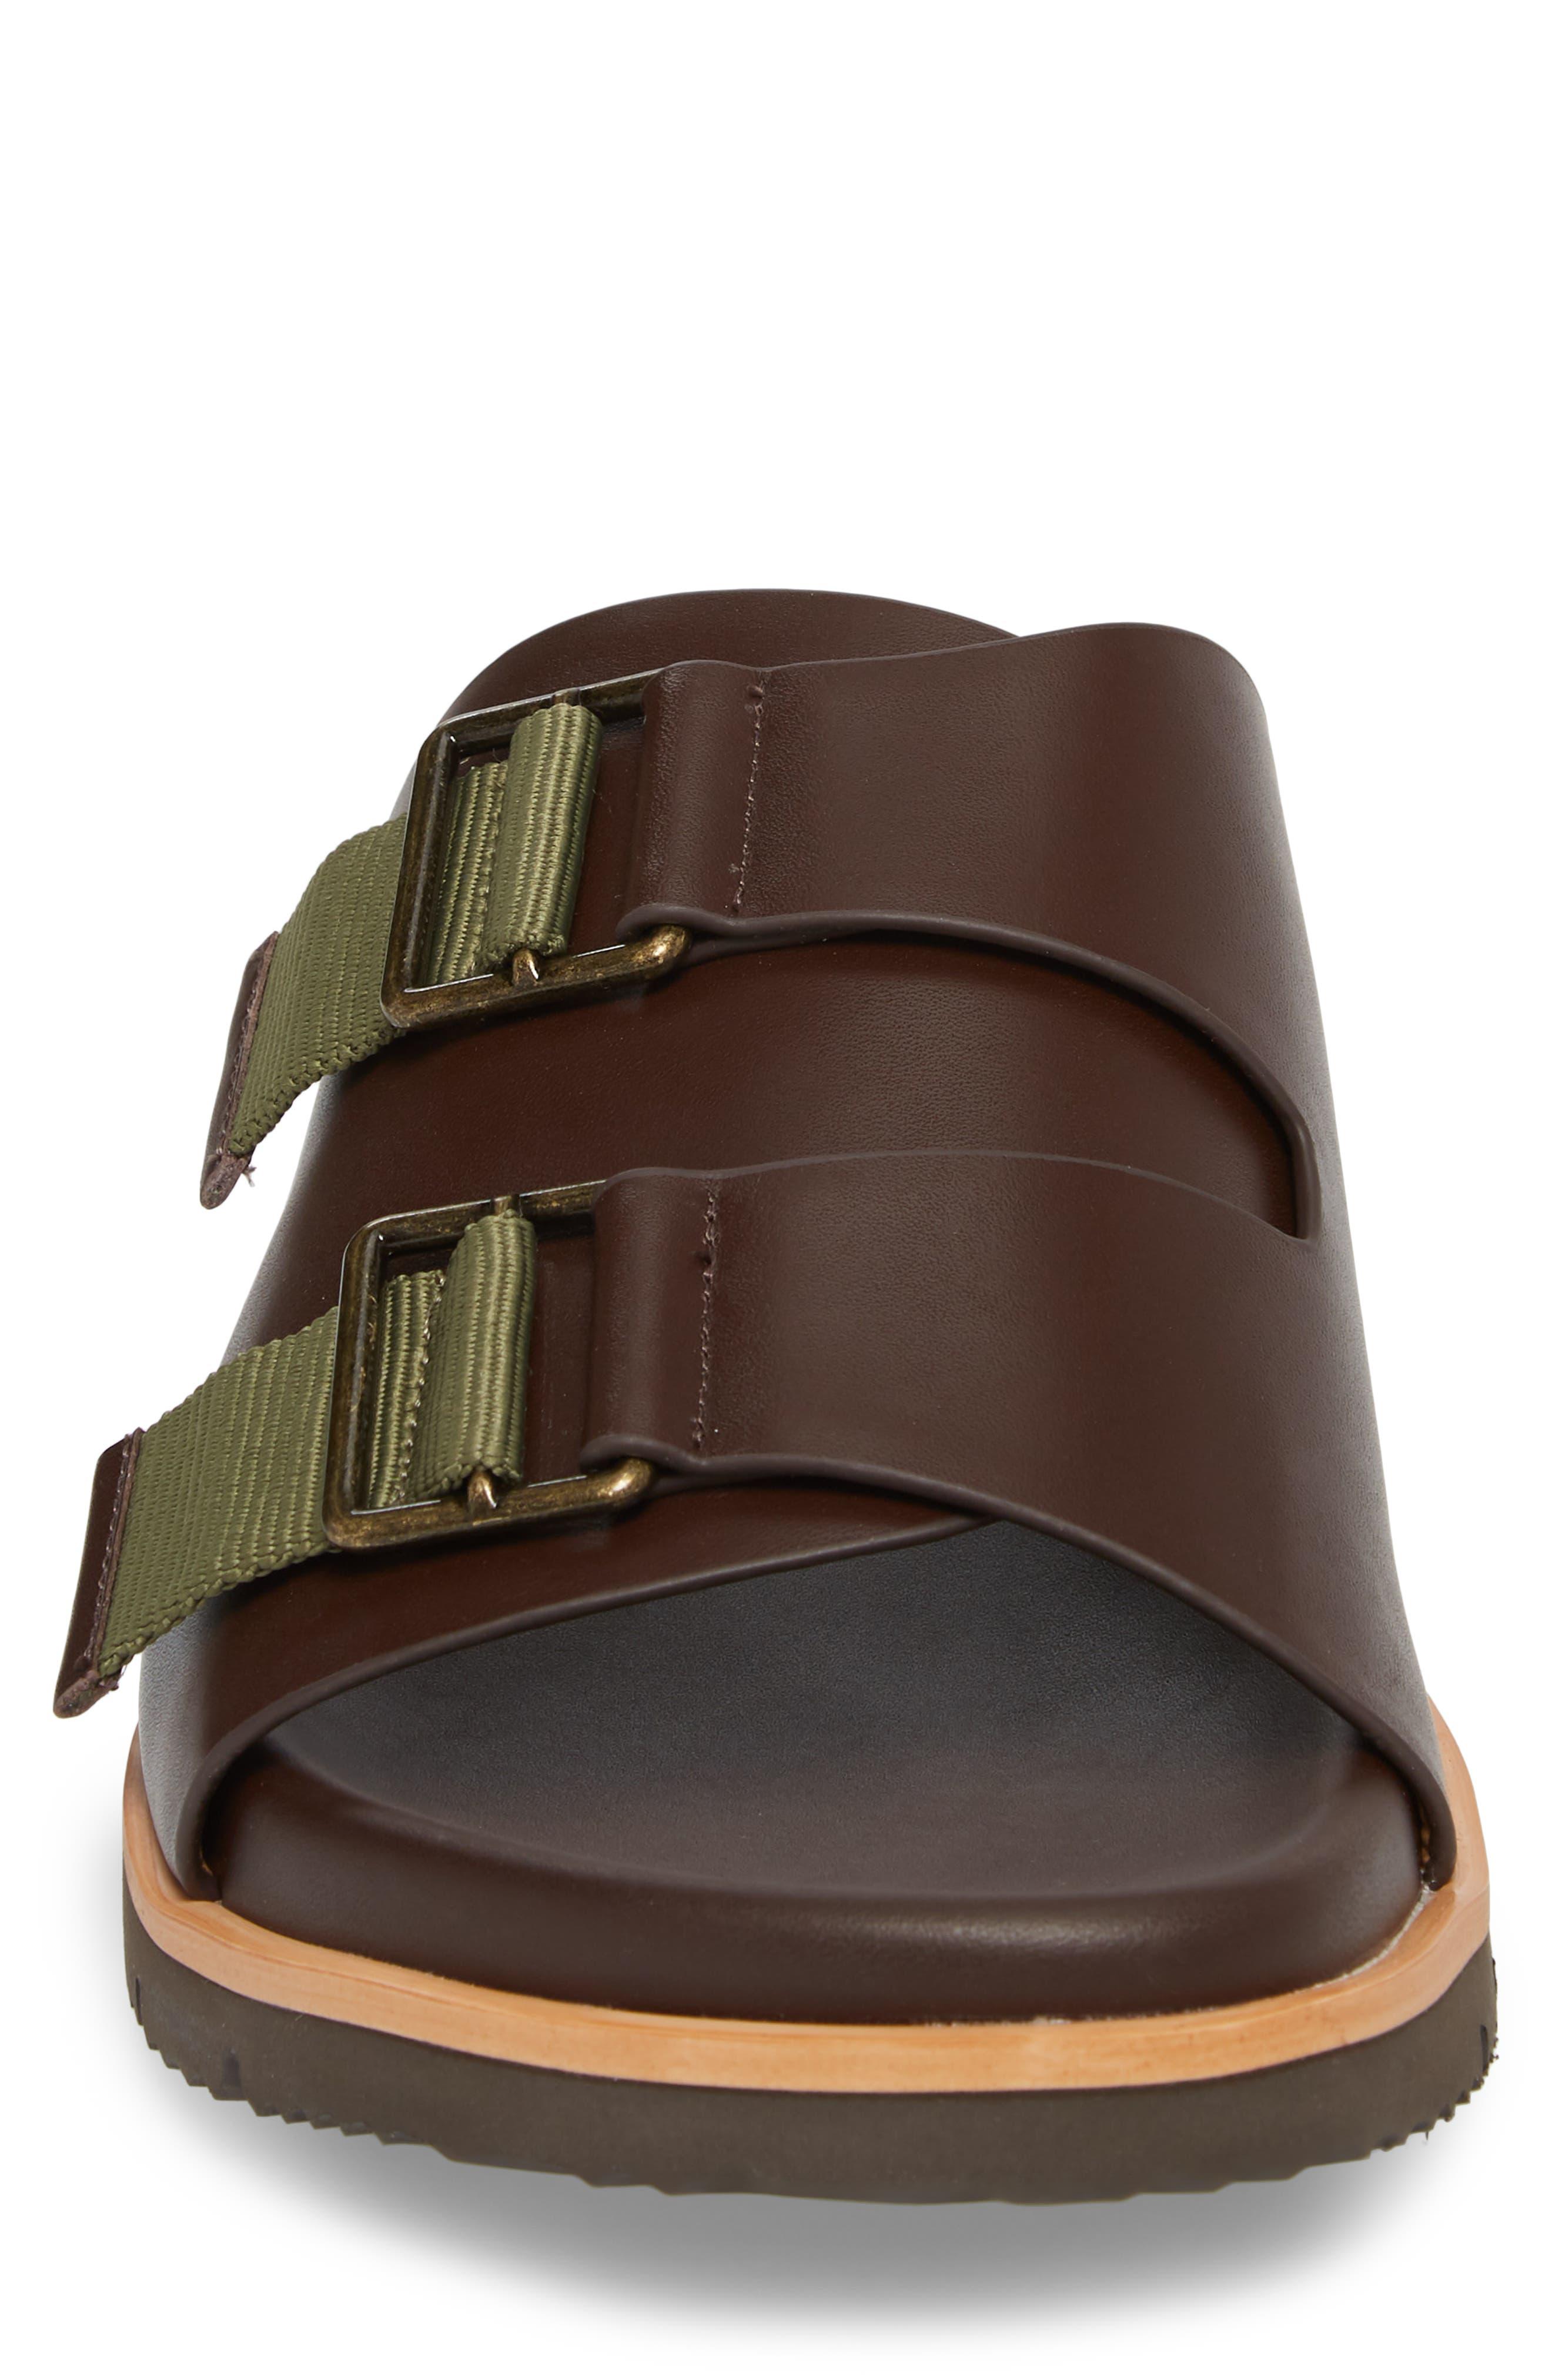 Slide Sandal,                             Alternate thumbnail 4, color,                             Expresso/ Tan Leather